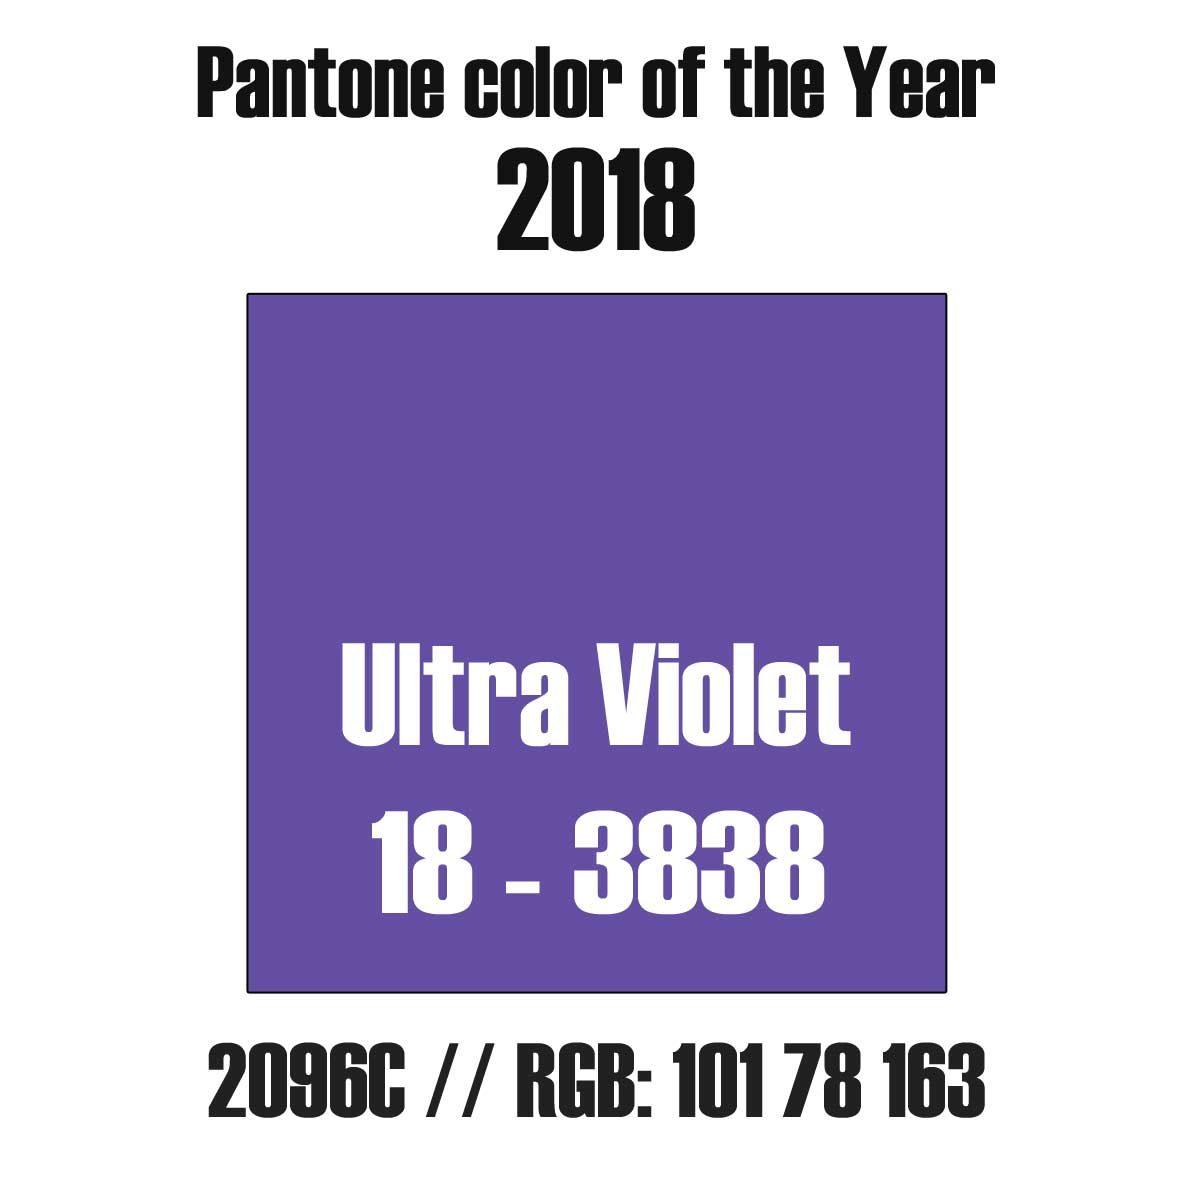 pantone color ultra violet in rgb